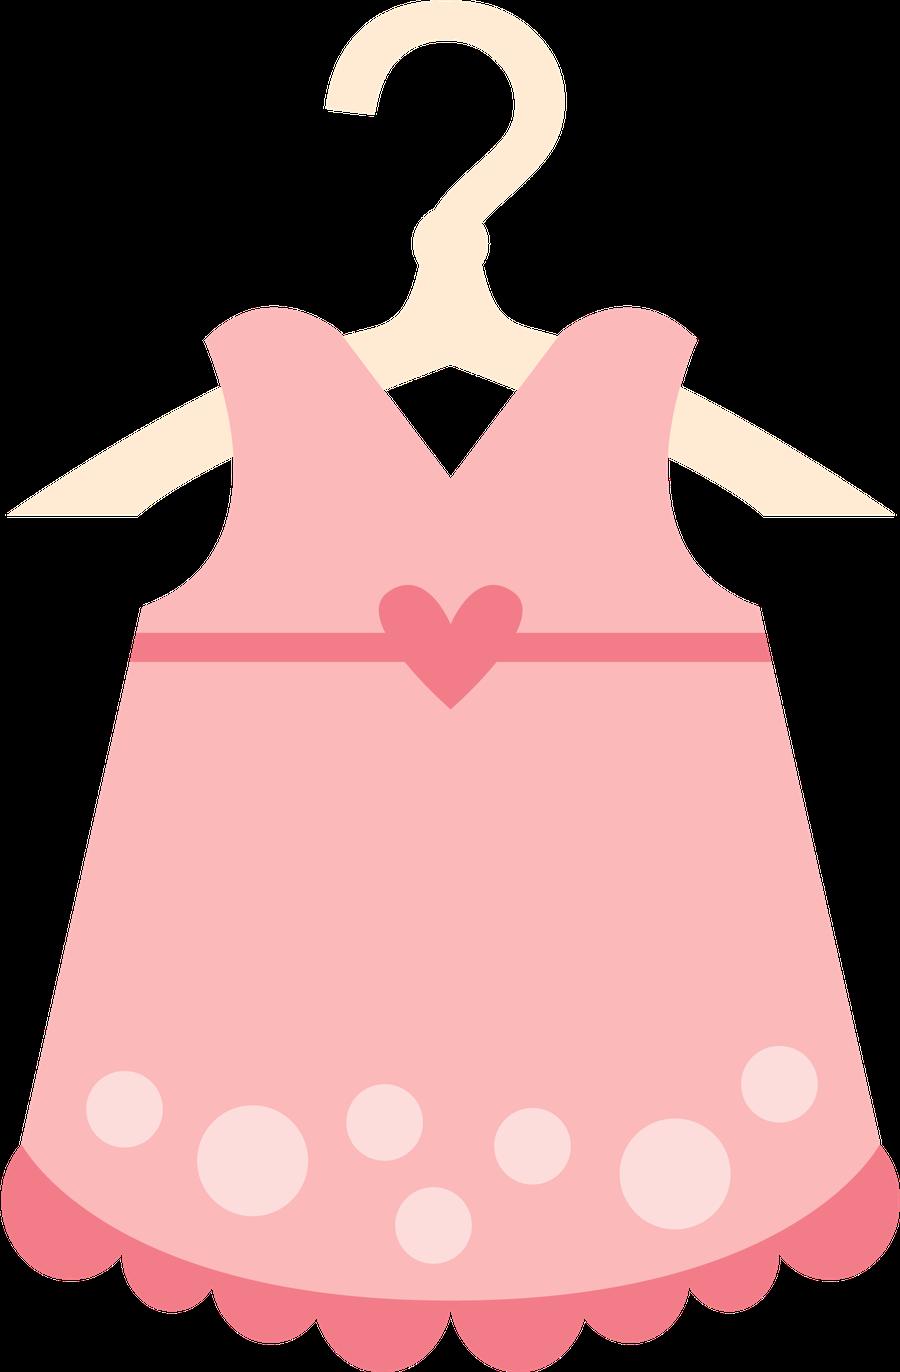 Baby overalls clipart png picture transparent download Bebê (Menino e Menina) - Minus | CLIPART - BABY, BABY CLOTHES, BABY ... picture transparent download